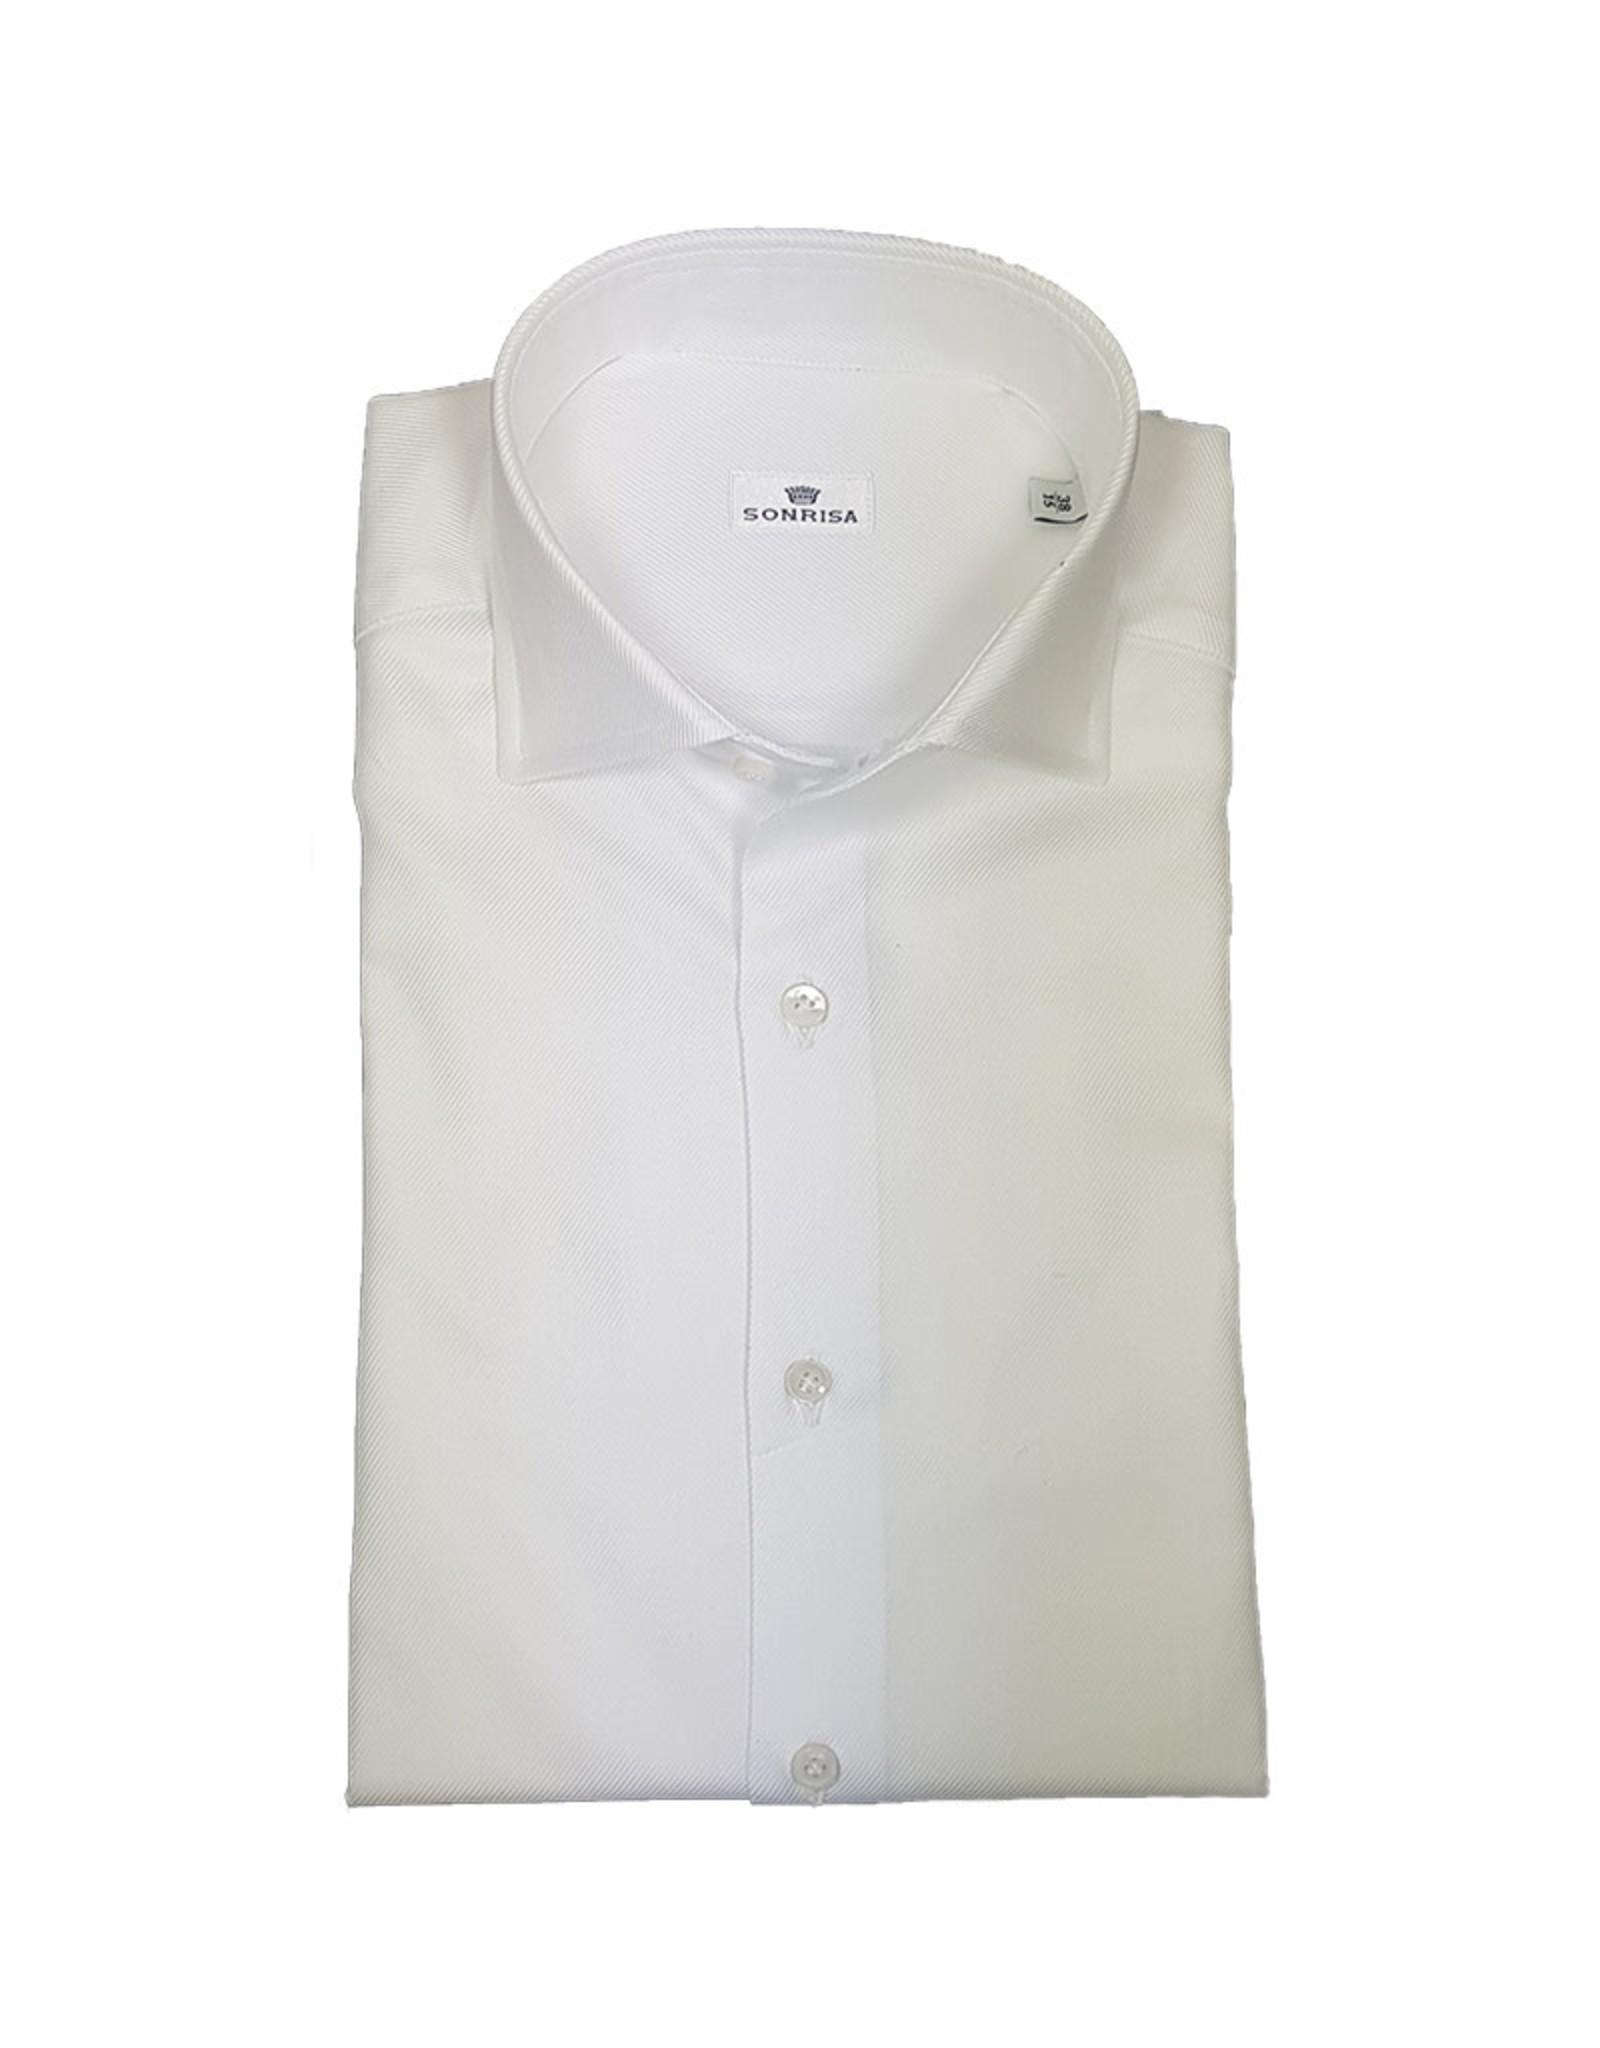 Sonrisa Sonrisa hemd wit Fitted body L1003/01